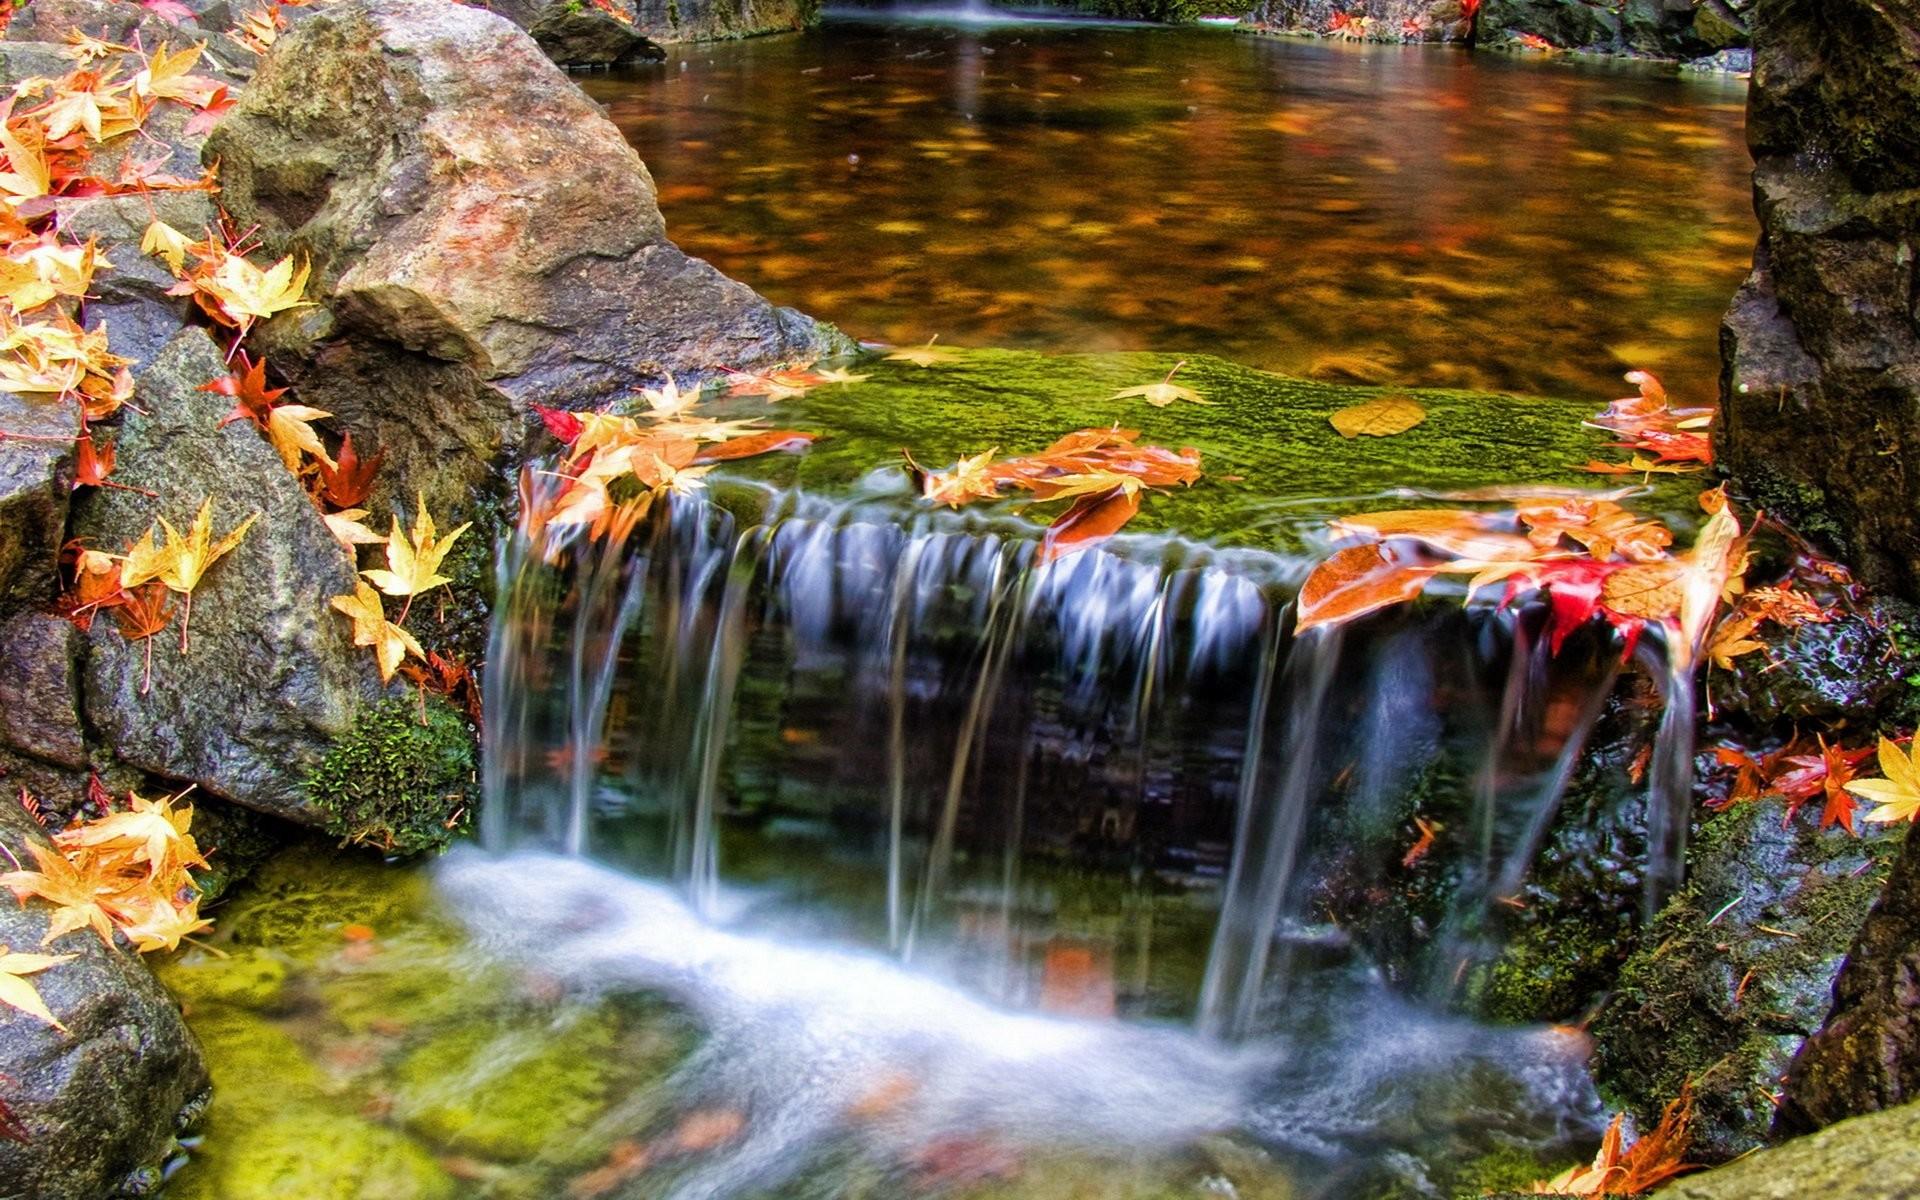 Free Screensavers and Backgrounds Screensavers · beautiful waterfall scenery  …